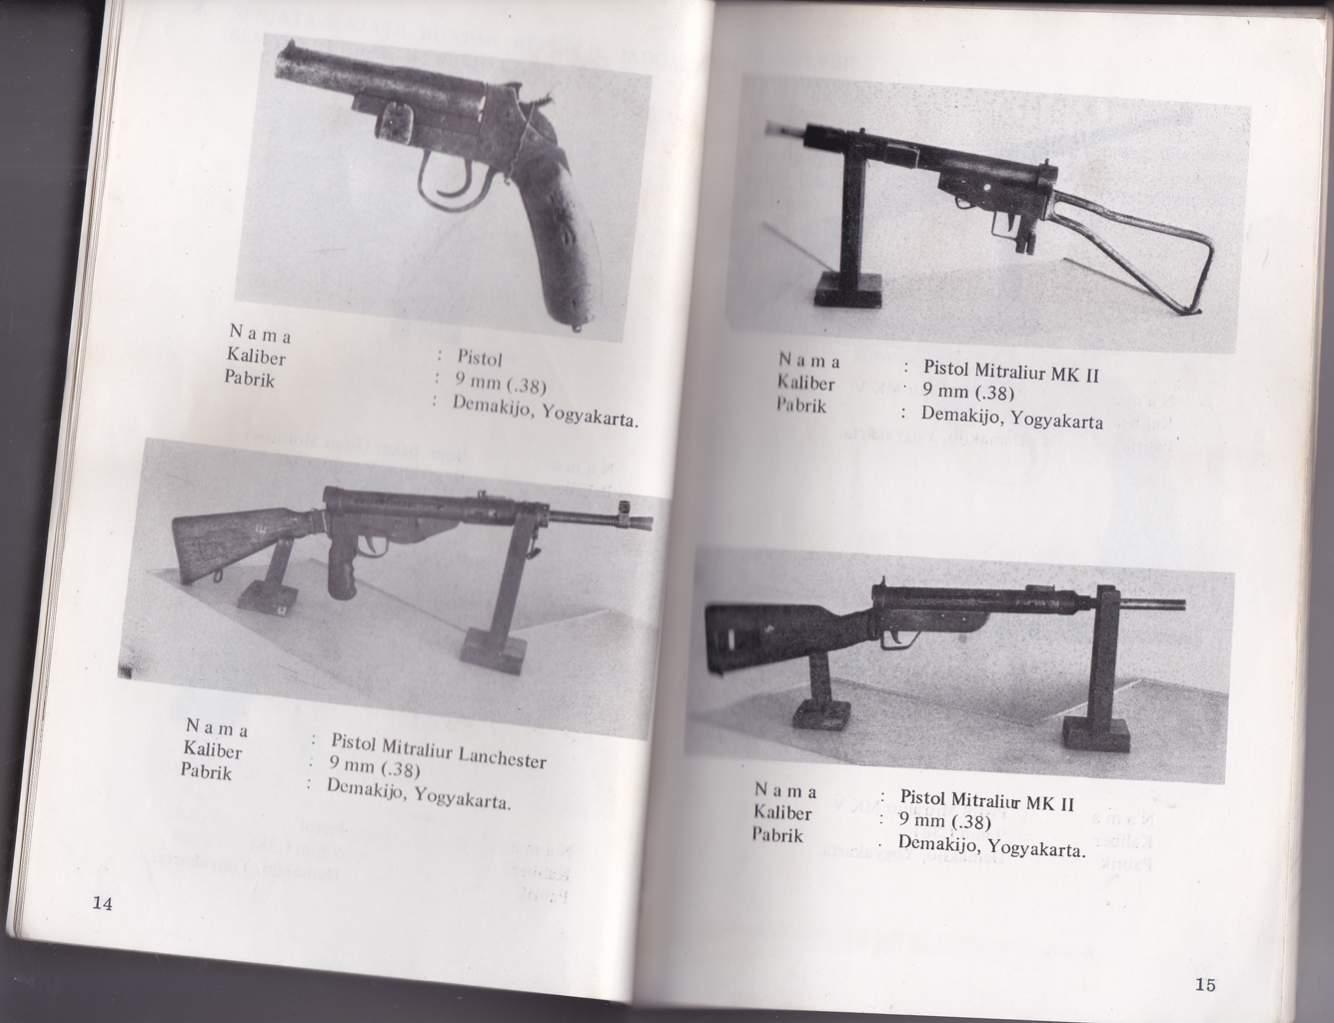 Koleksi Senjata Buatan Pabrik Demakijo | Sumber dok: Verkedell's